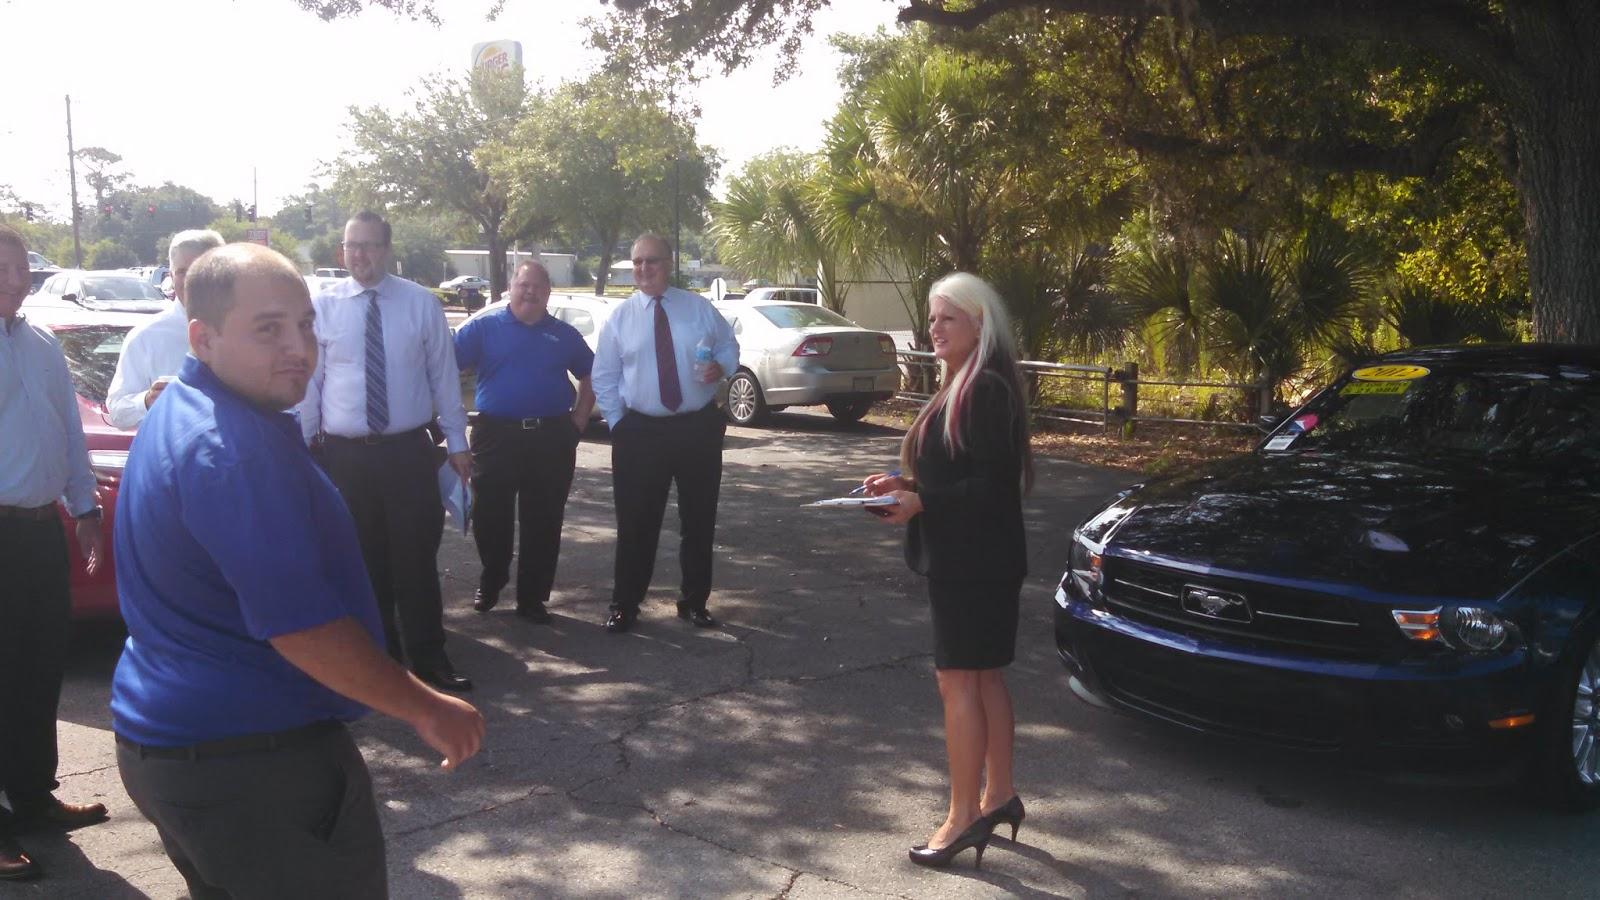 Ford Lincoln Of Ocalau0027s Community Involvement